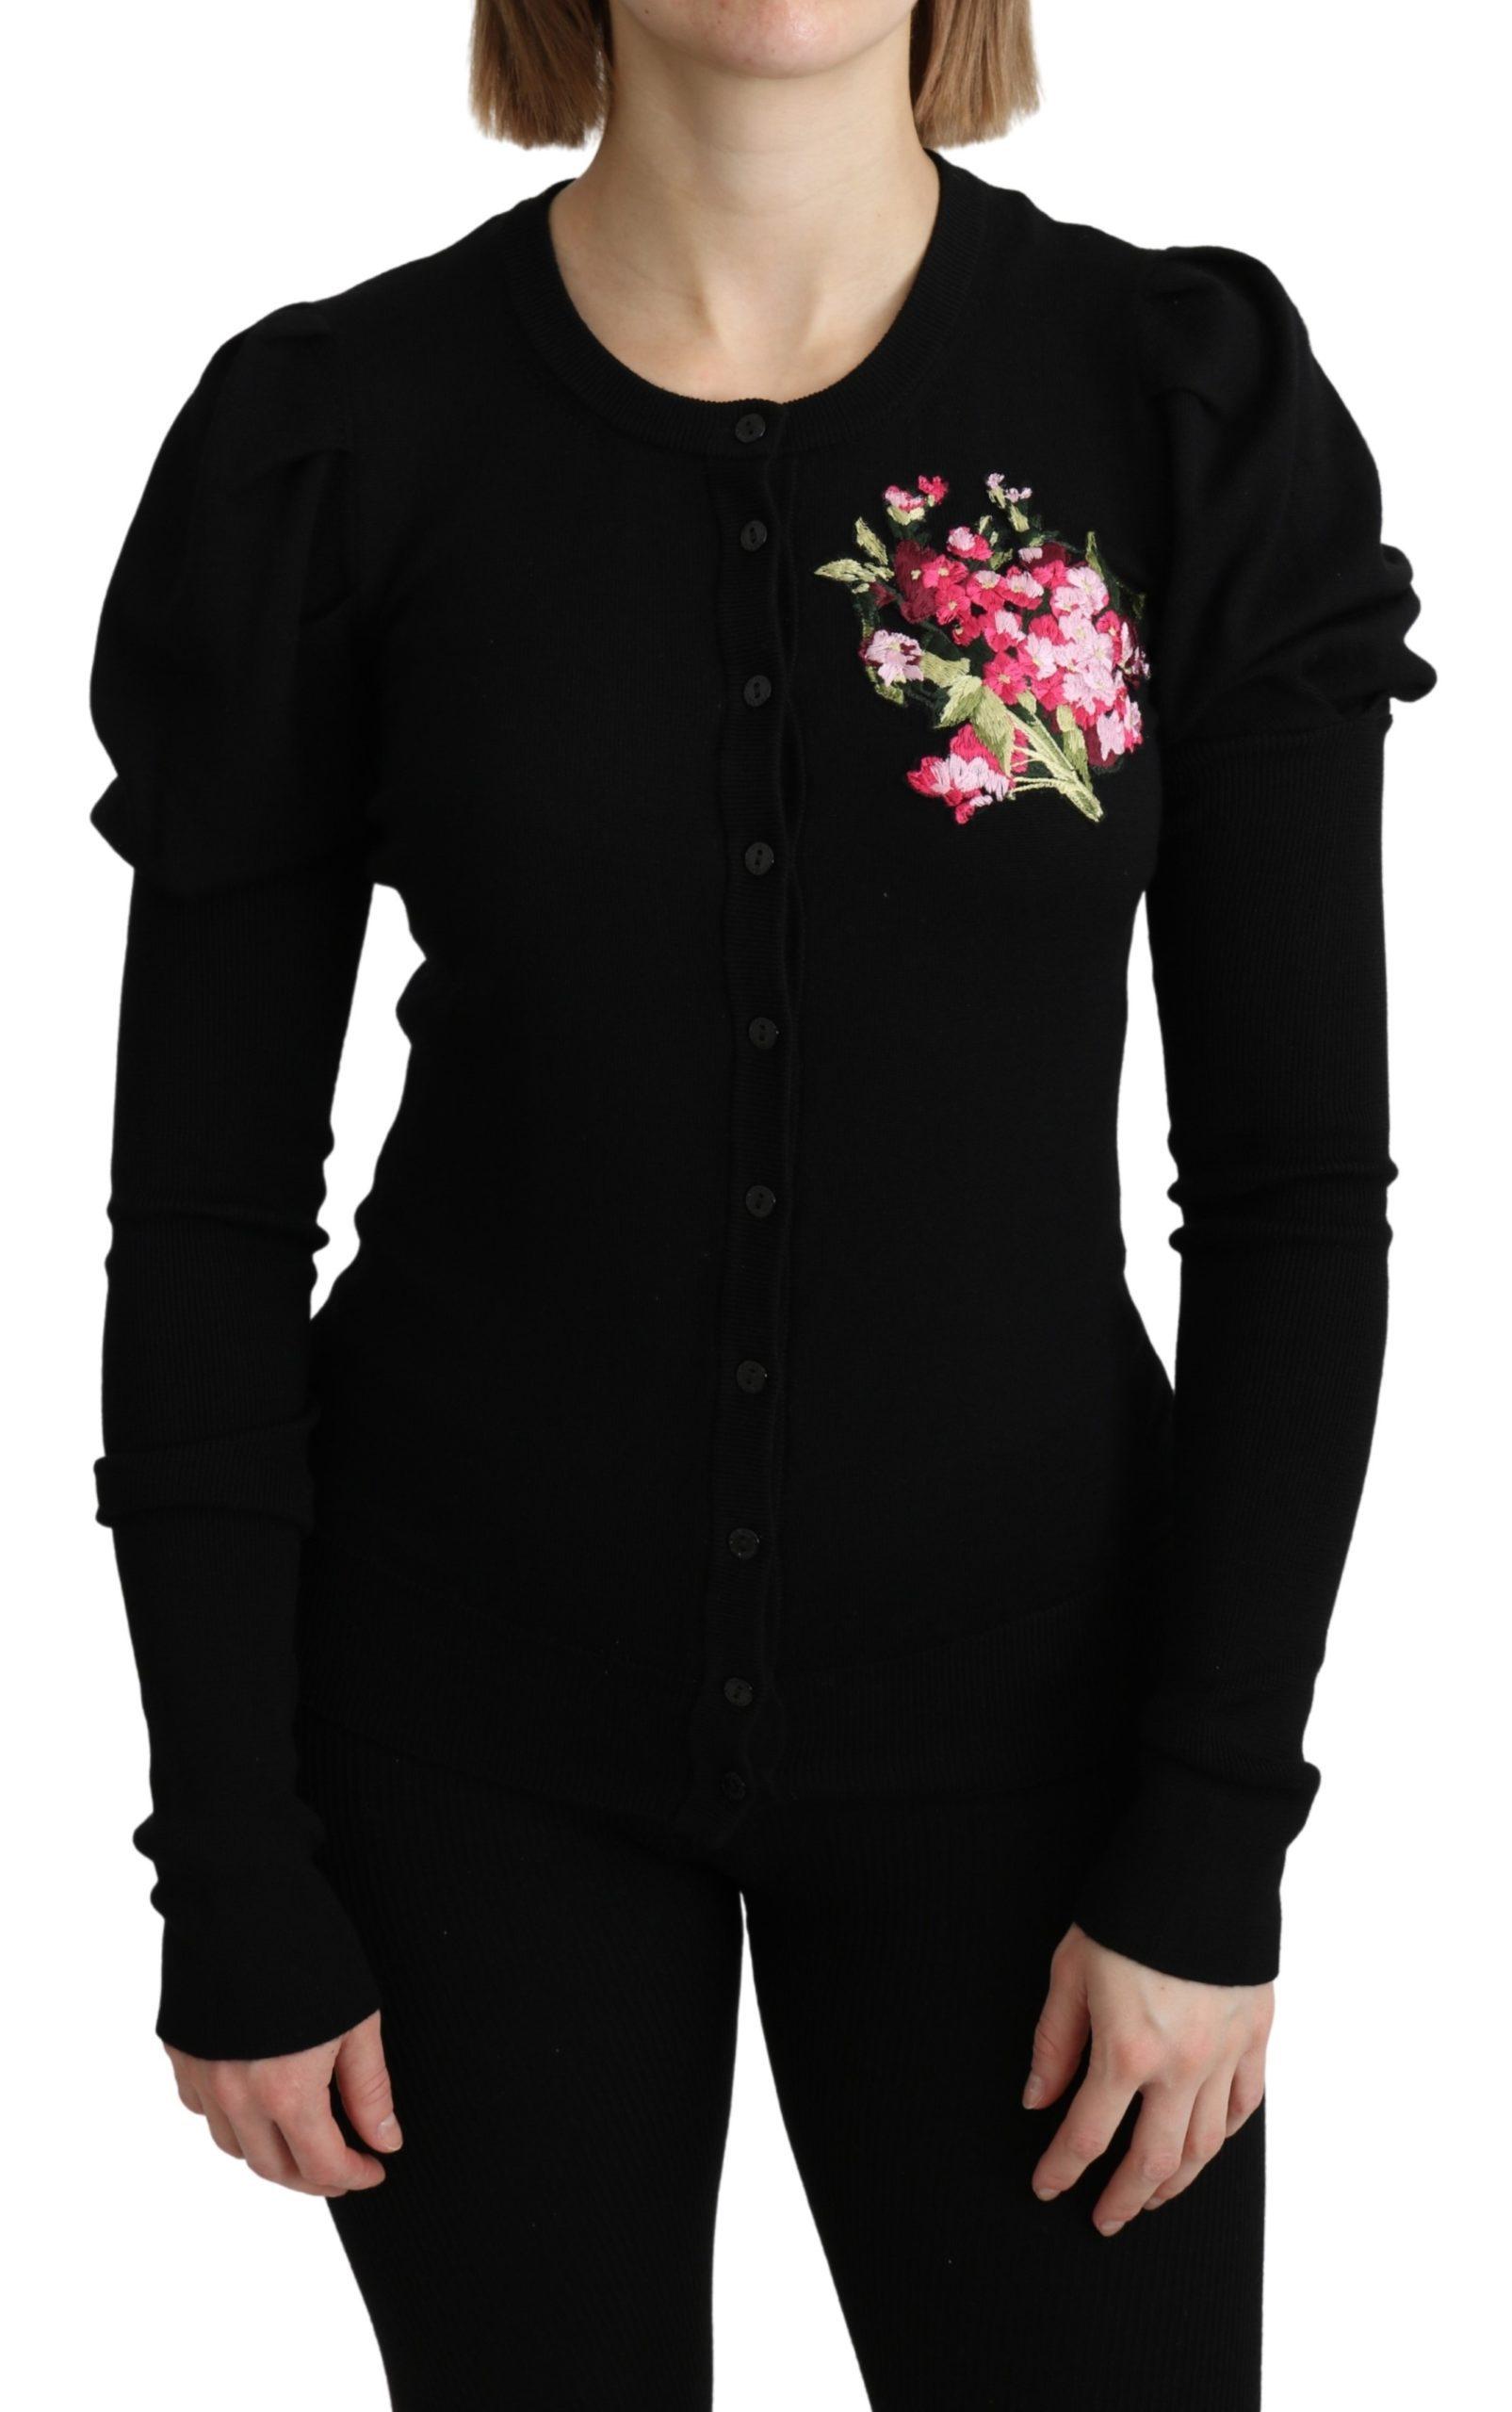 Dolce & Gabbana Women's Floral LS Cardigan Black TSH4906 - IT40|S